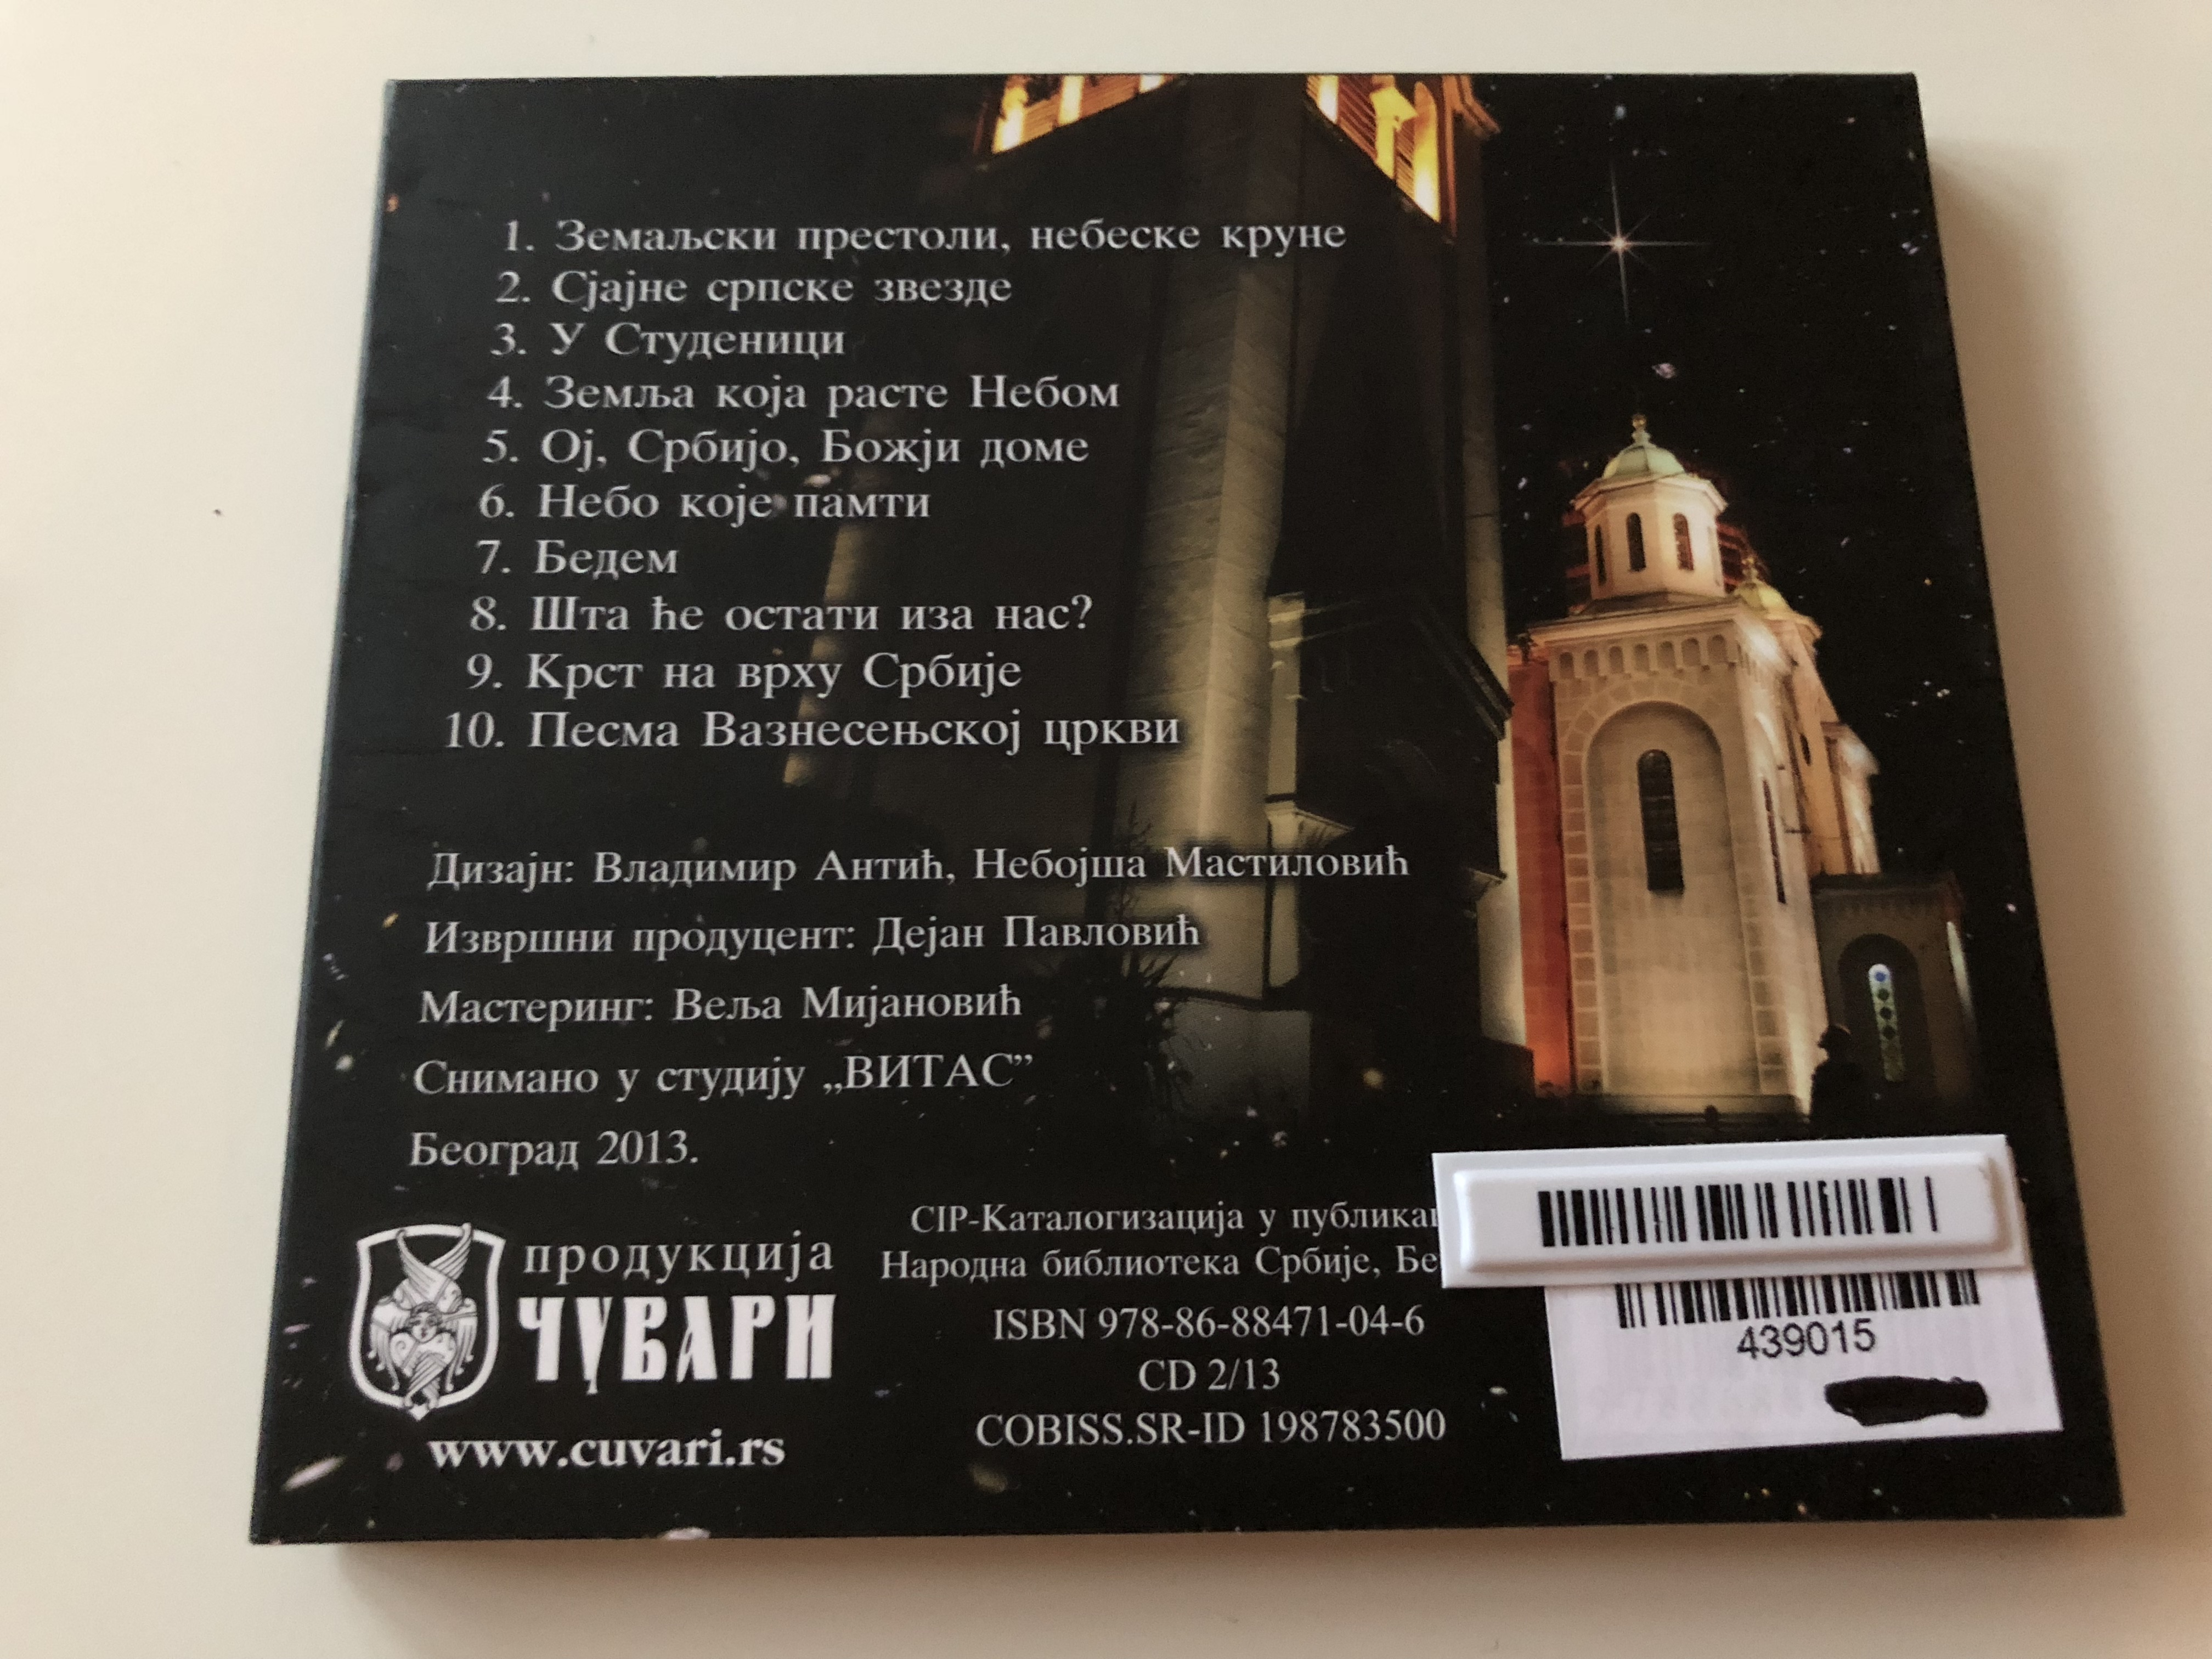 serbian-bright-serbian-stars-orthodox-music-cd-11-.jpg